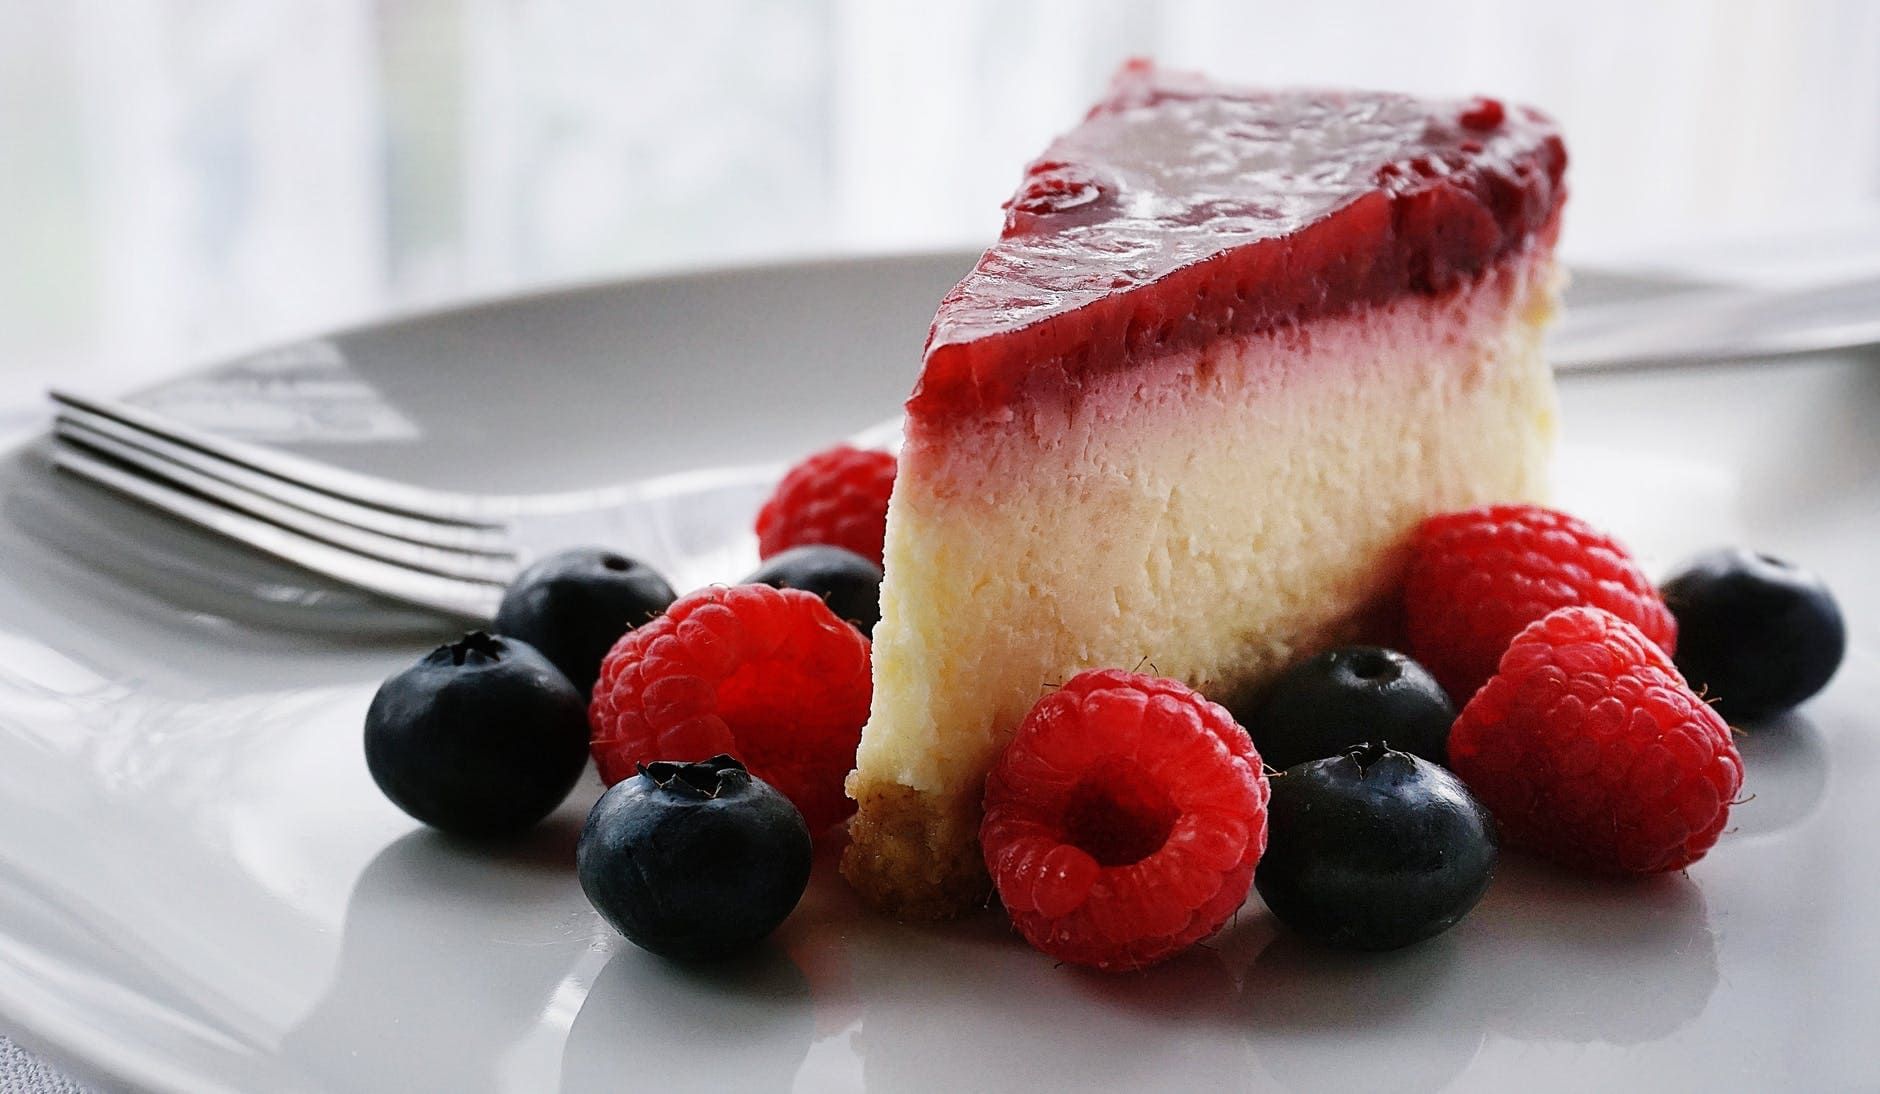 How to make a Turkish Revani cake